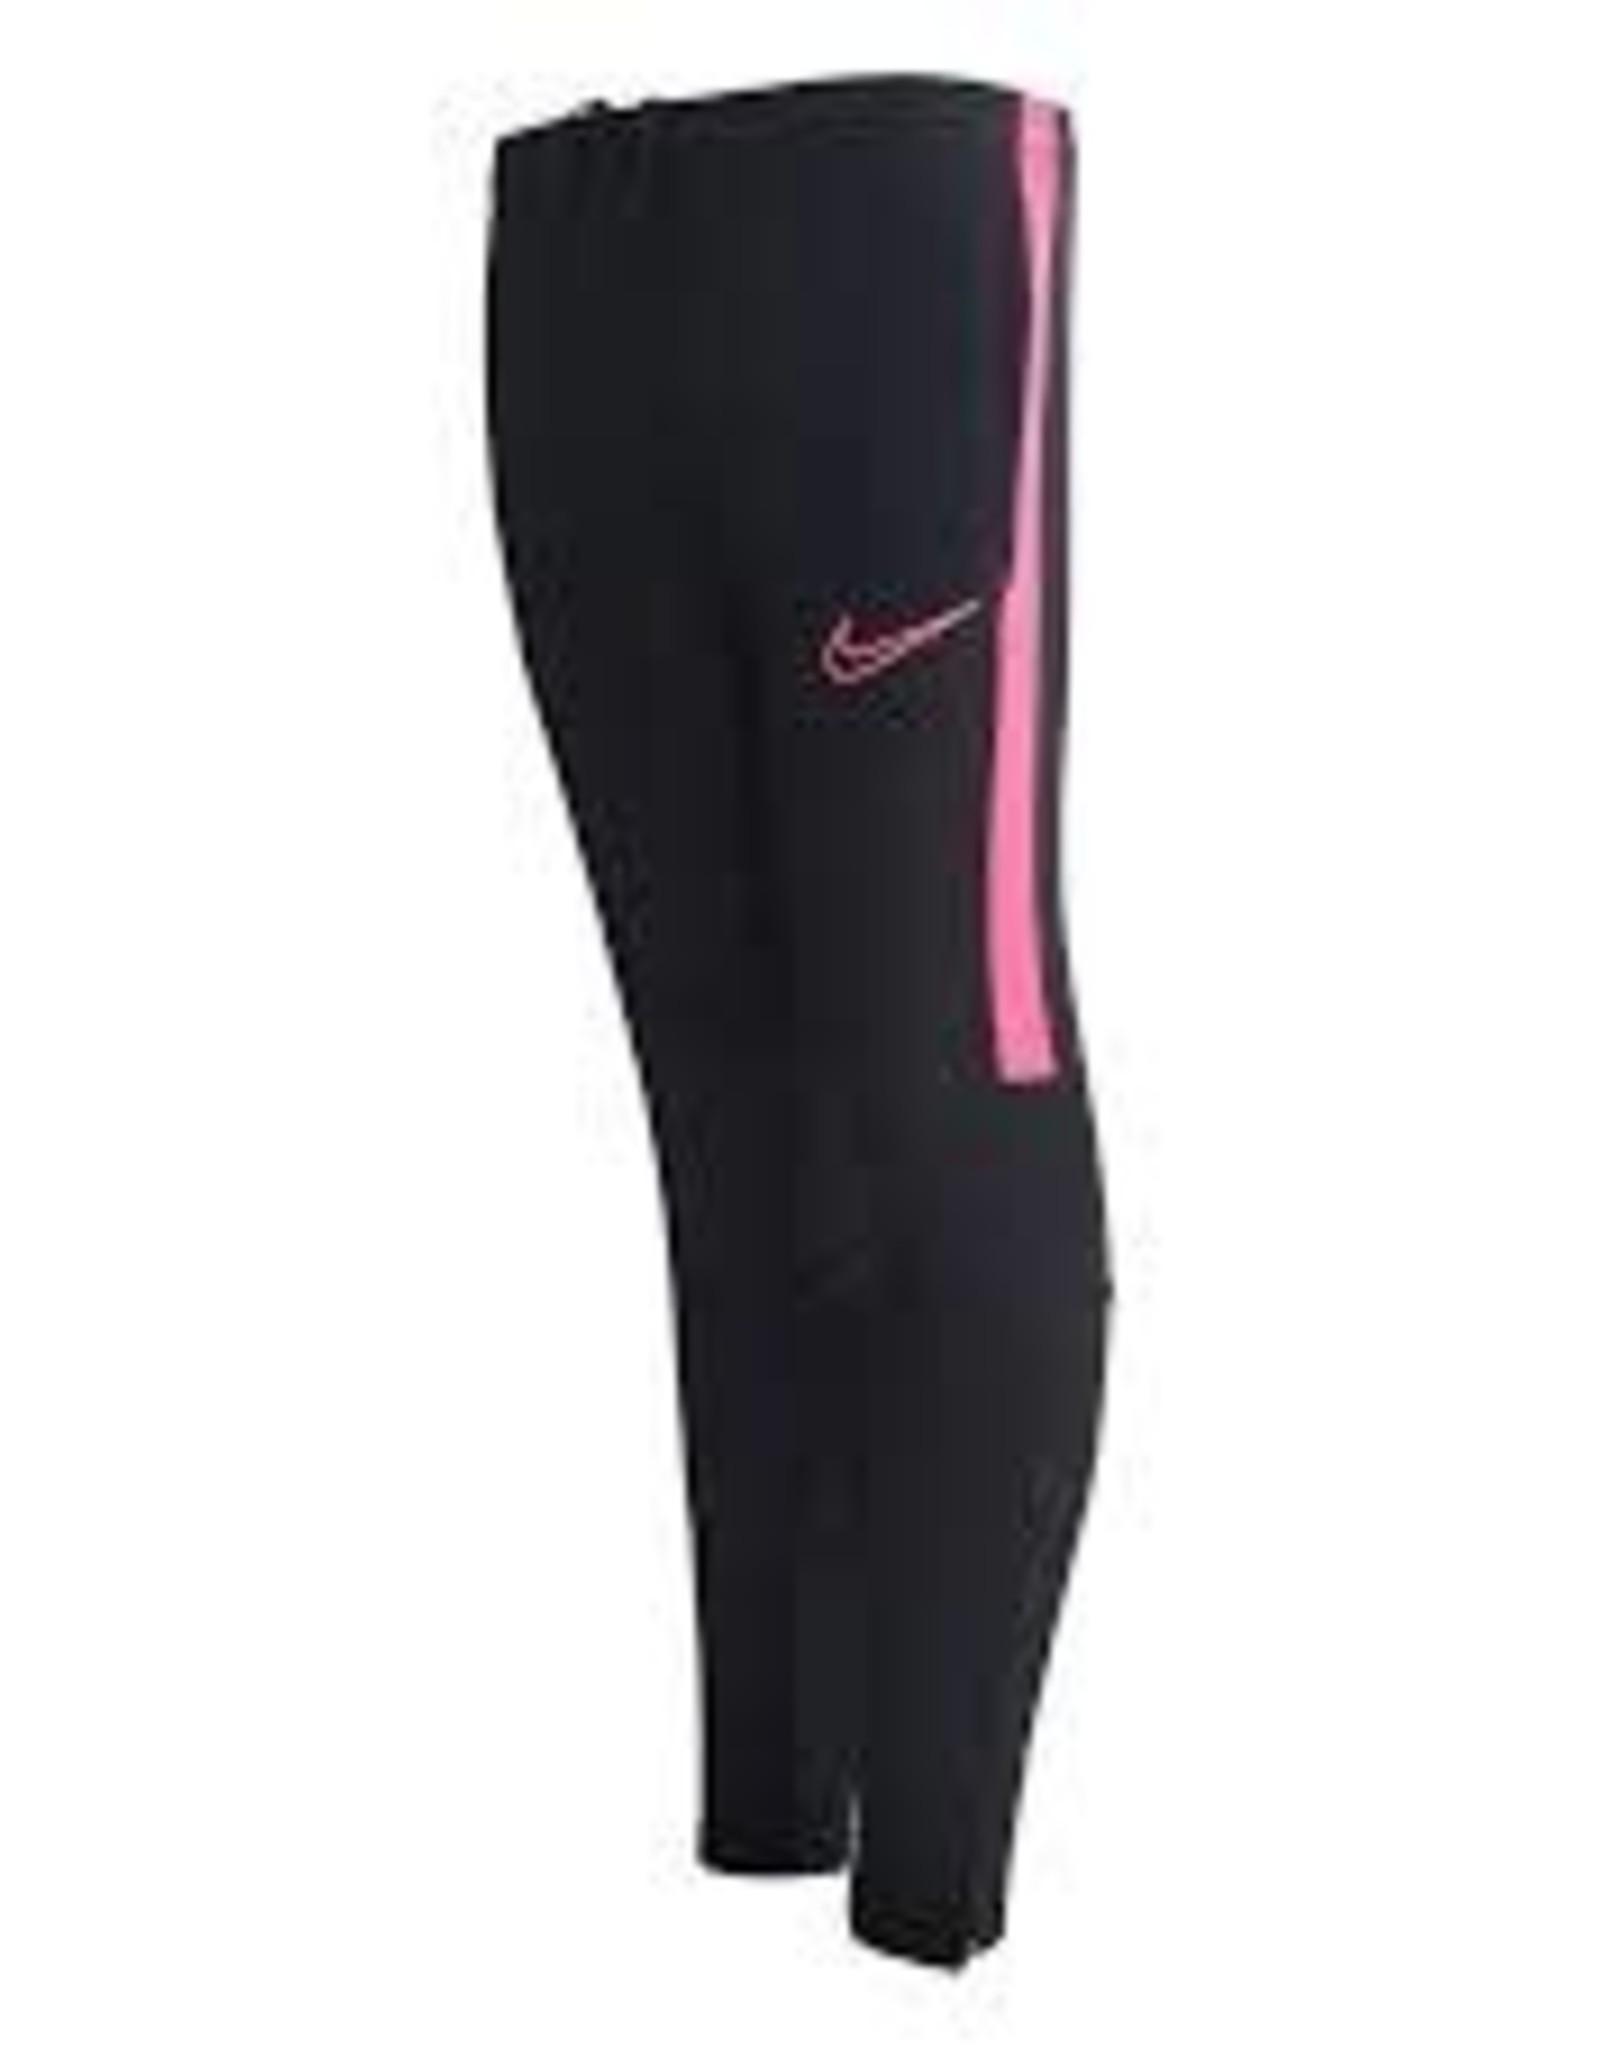 Nike Dri-fit academy black/pink